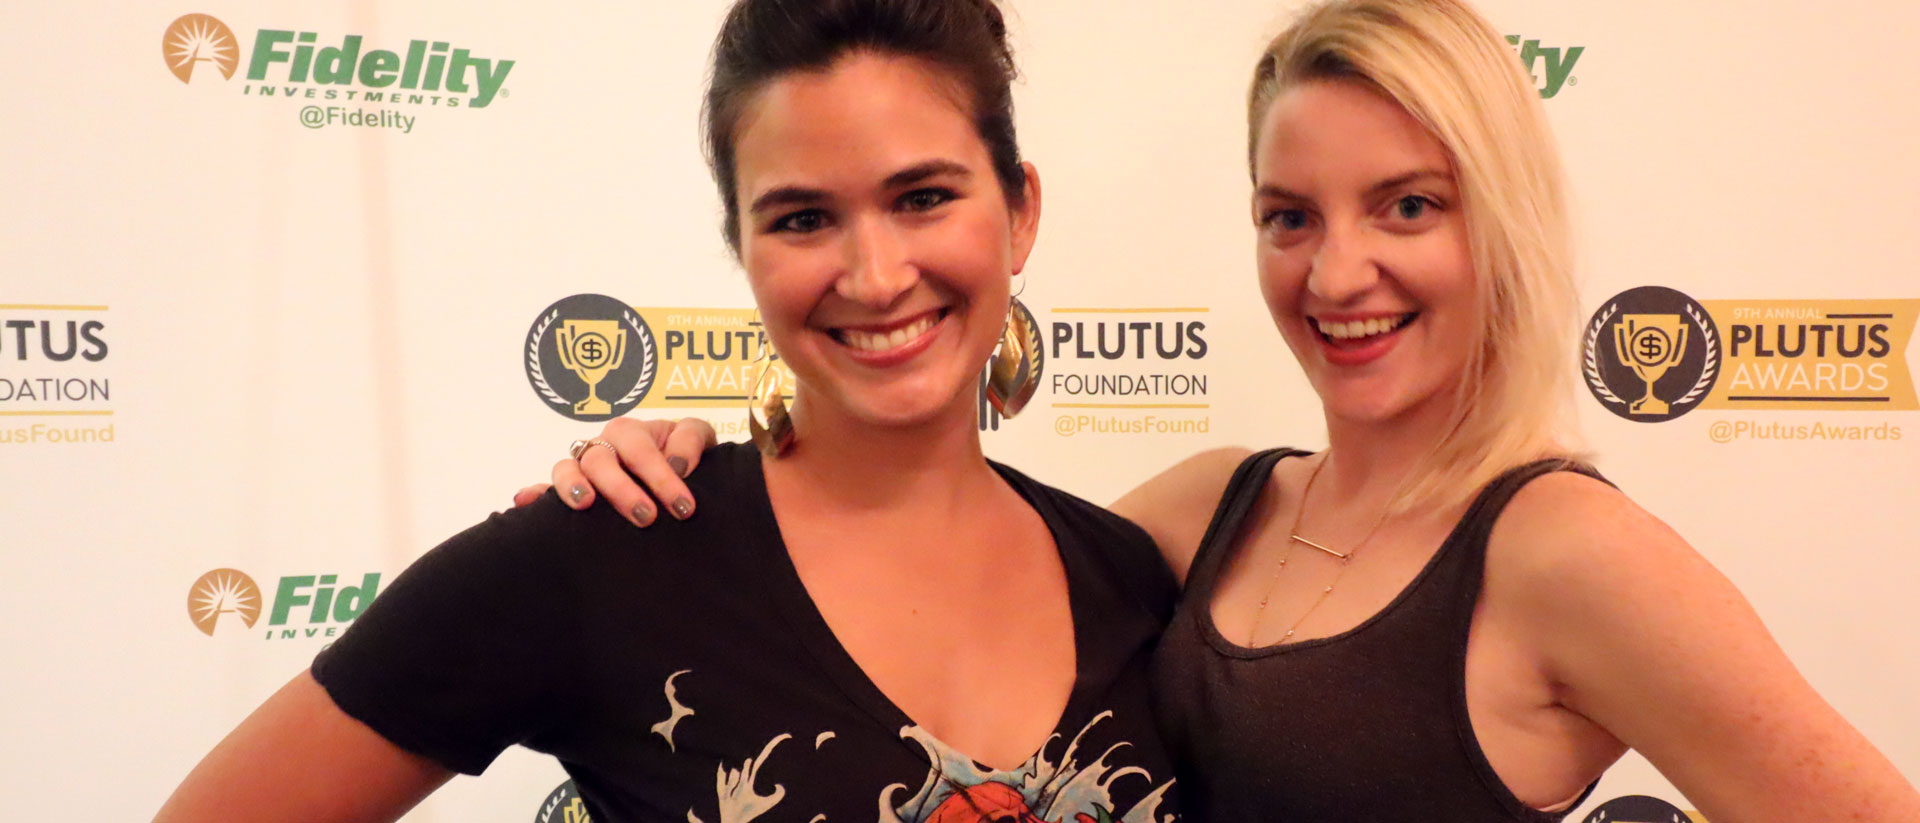 Fidelity Plutus Awards Partner